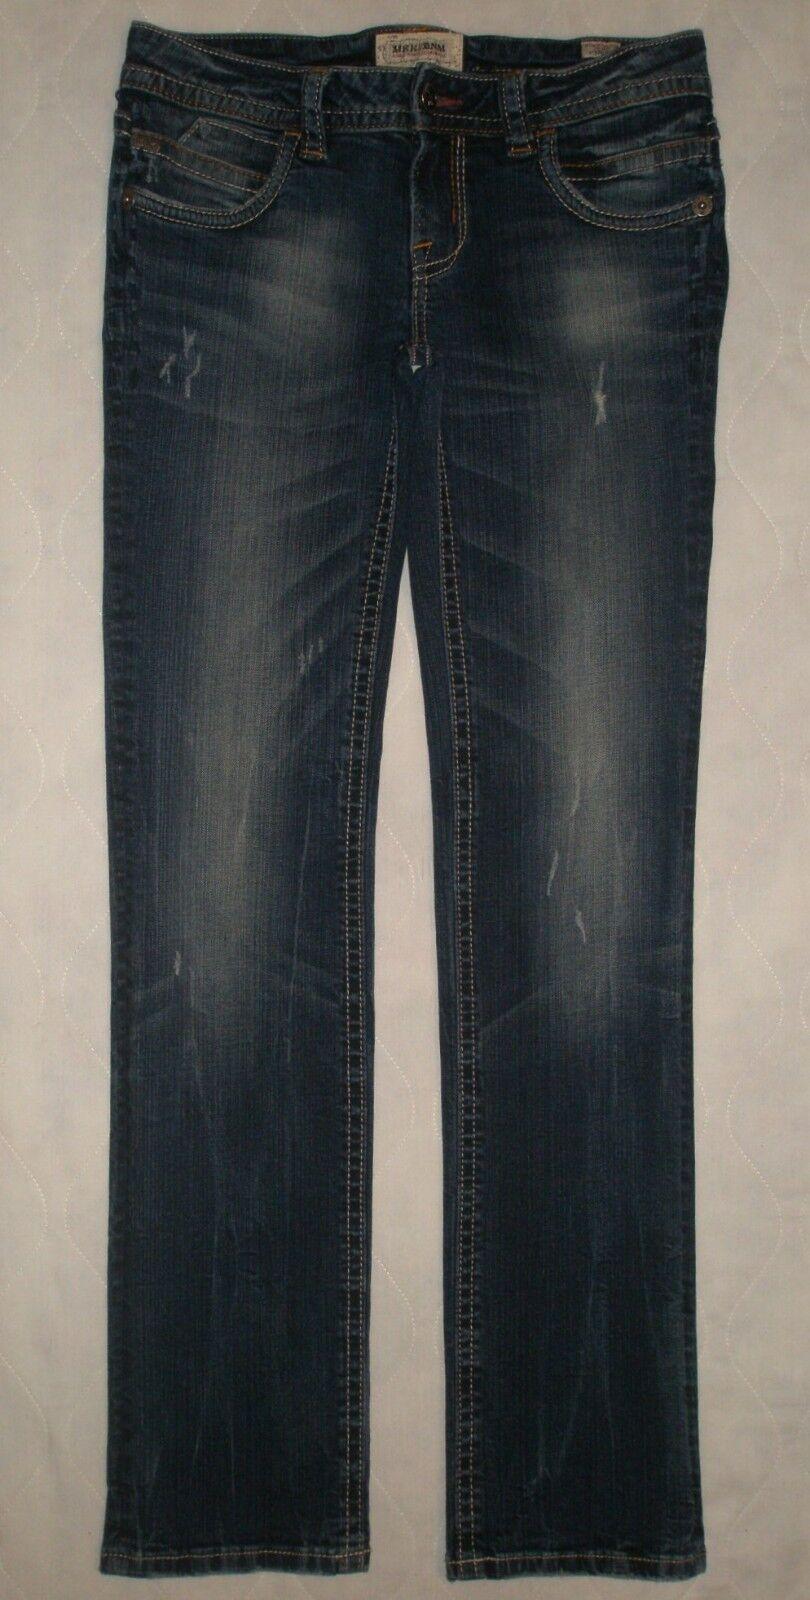 Mek Denim Ulan-Bator Straight Leg Stretch Jeans Womens Size 28 34